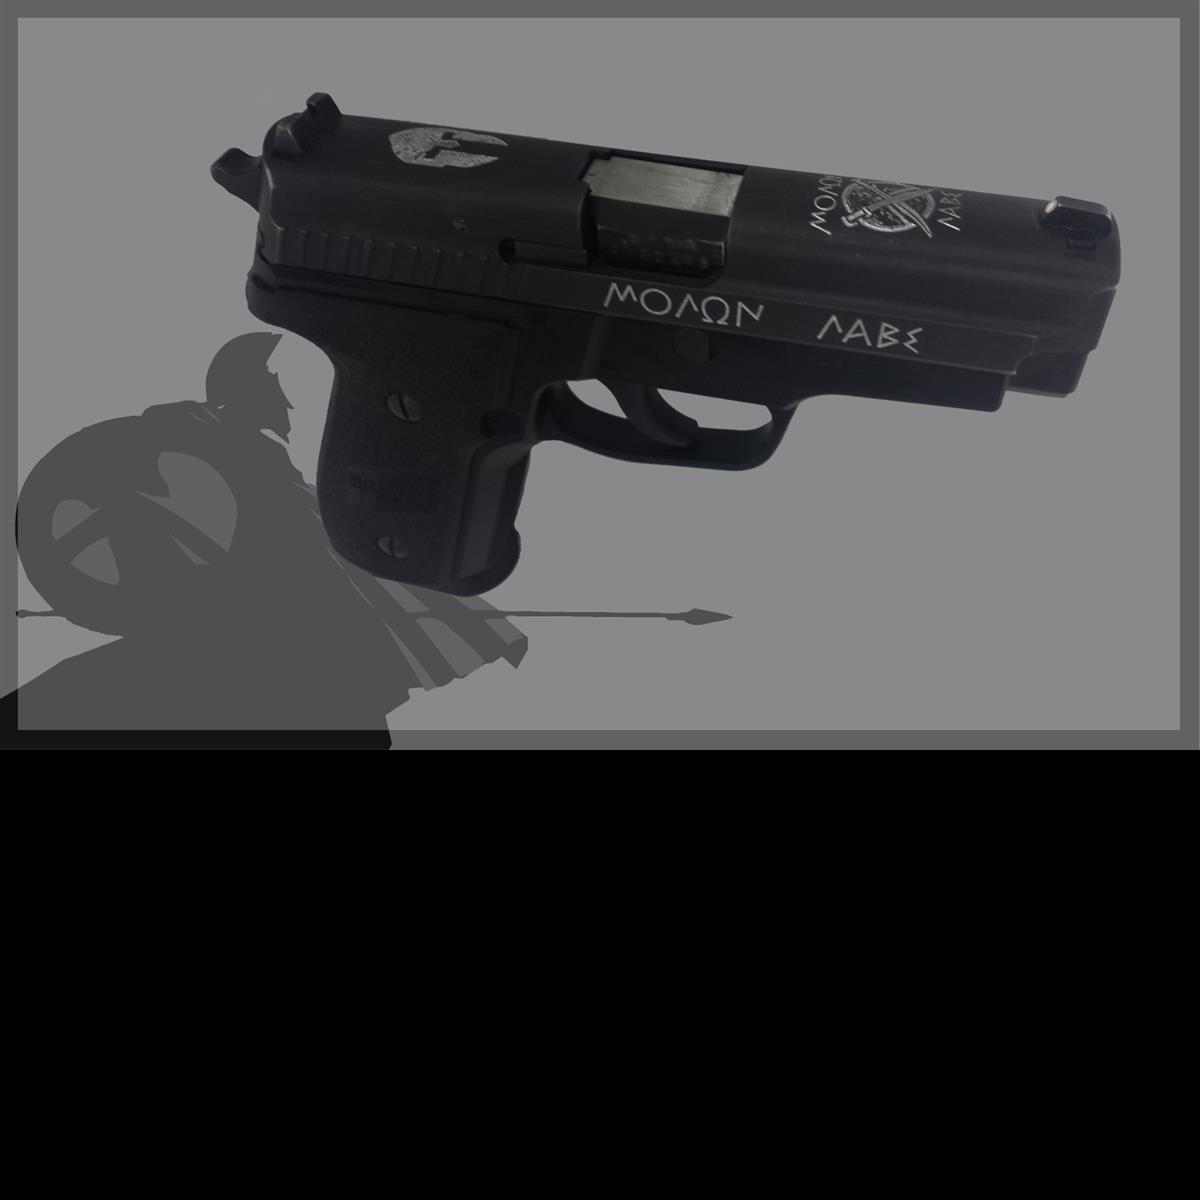 gun, firearms, engraving, sparta, come and take it